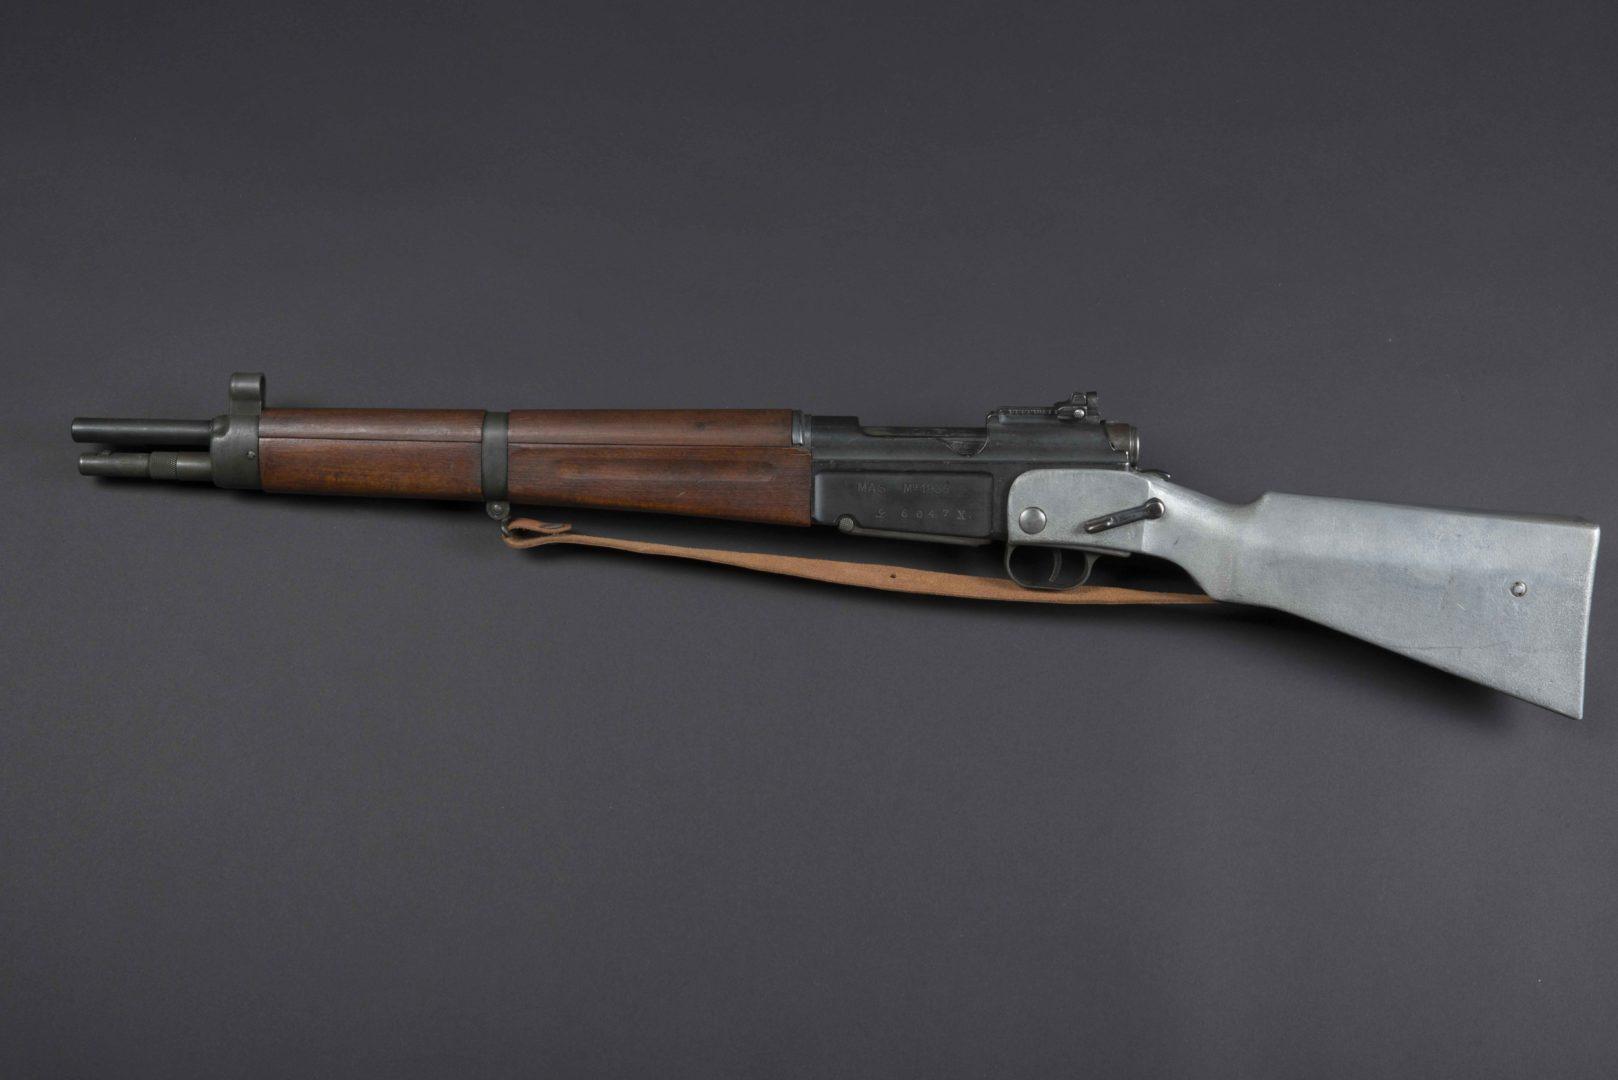 Fusil MAS36 CR39 crosse pliante, neutralisé